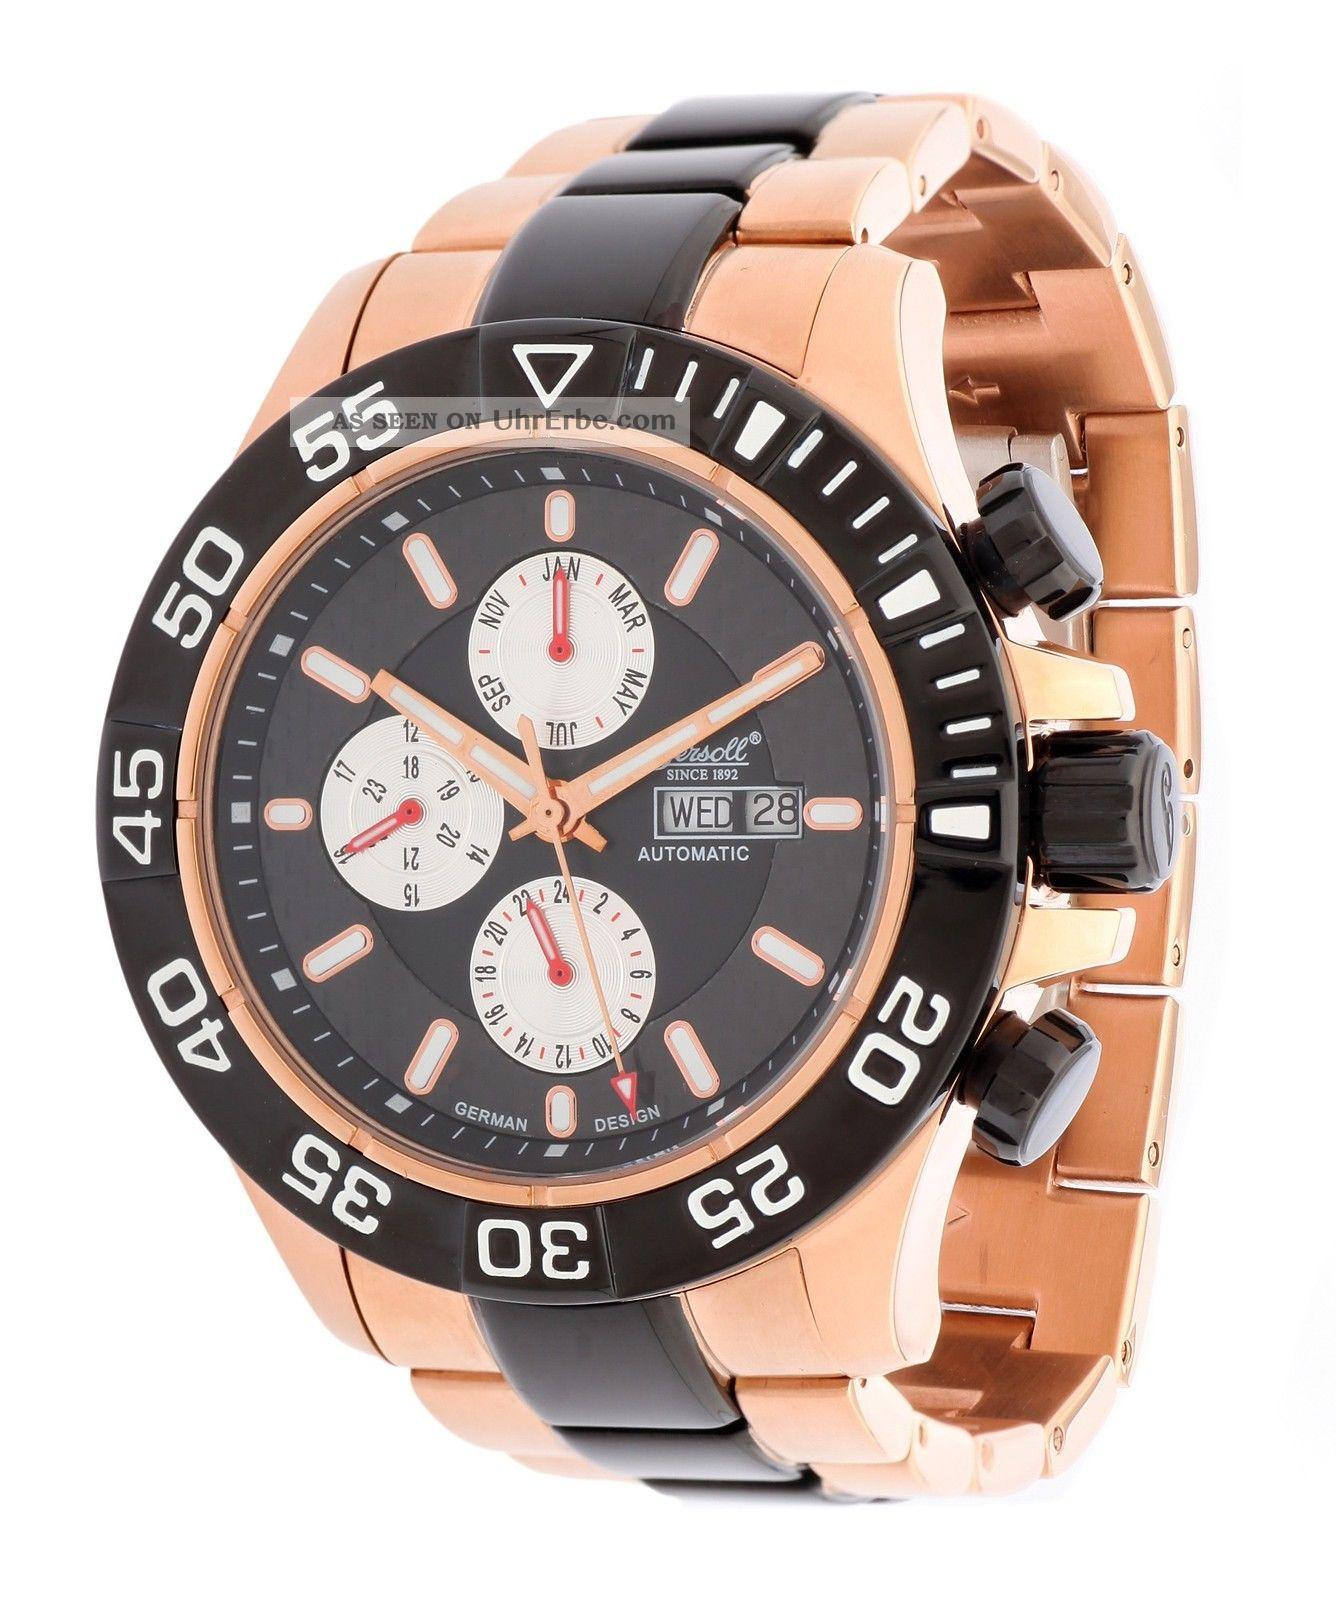 Ingersoll Herren Automatik Uhr Pico Rotgold In1627rbkm Armbanduhren Bild